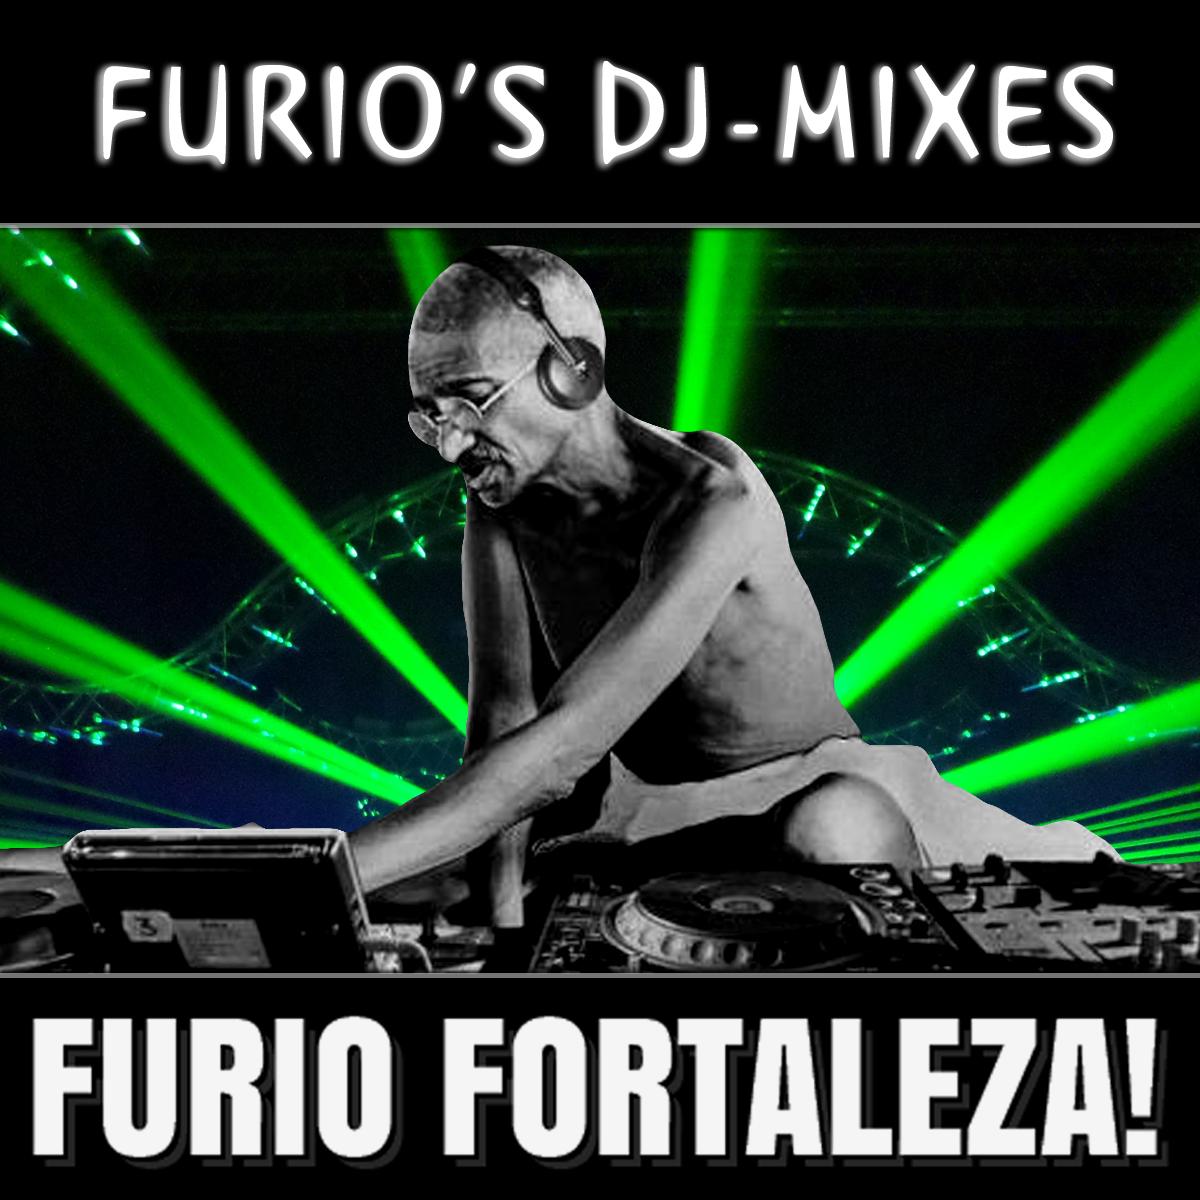 Furio Fortaleza! - DJ-Mixes